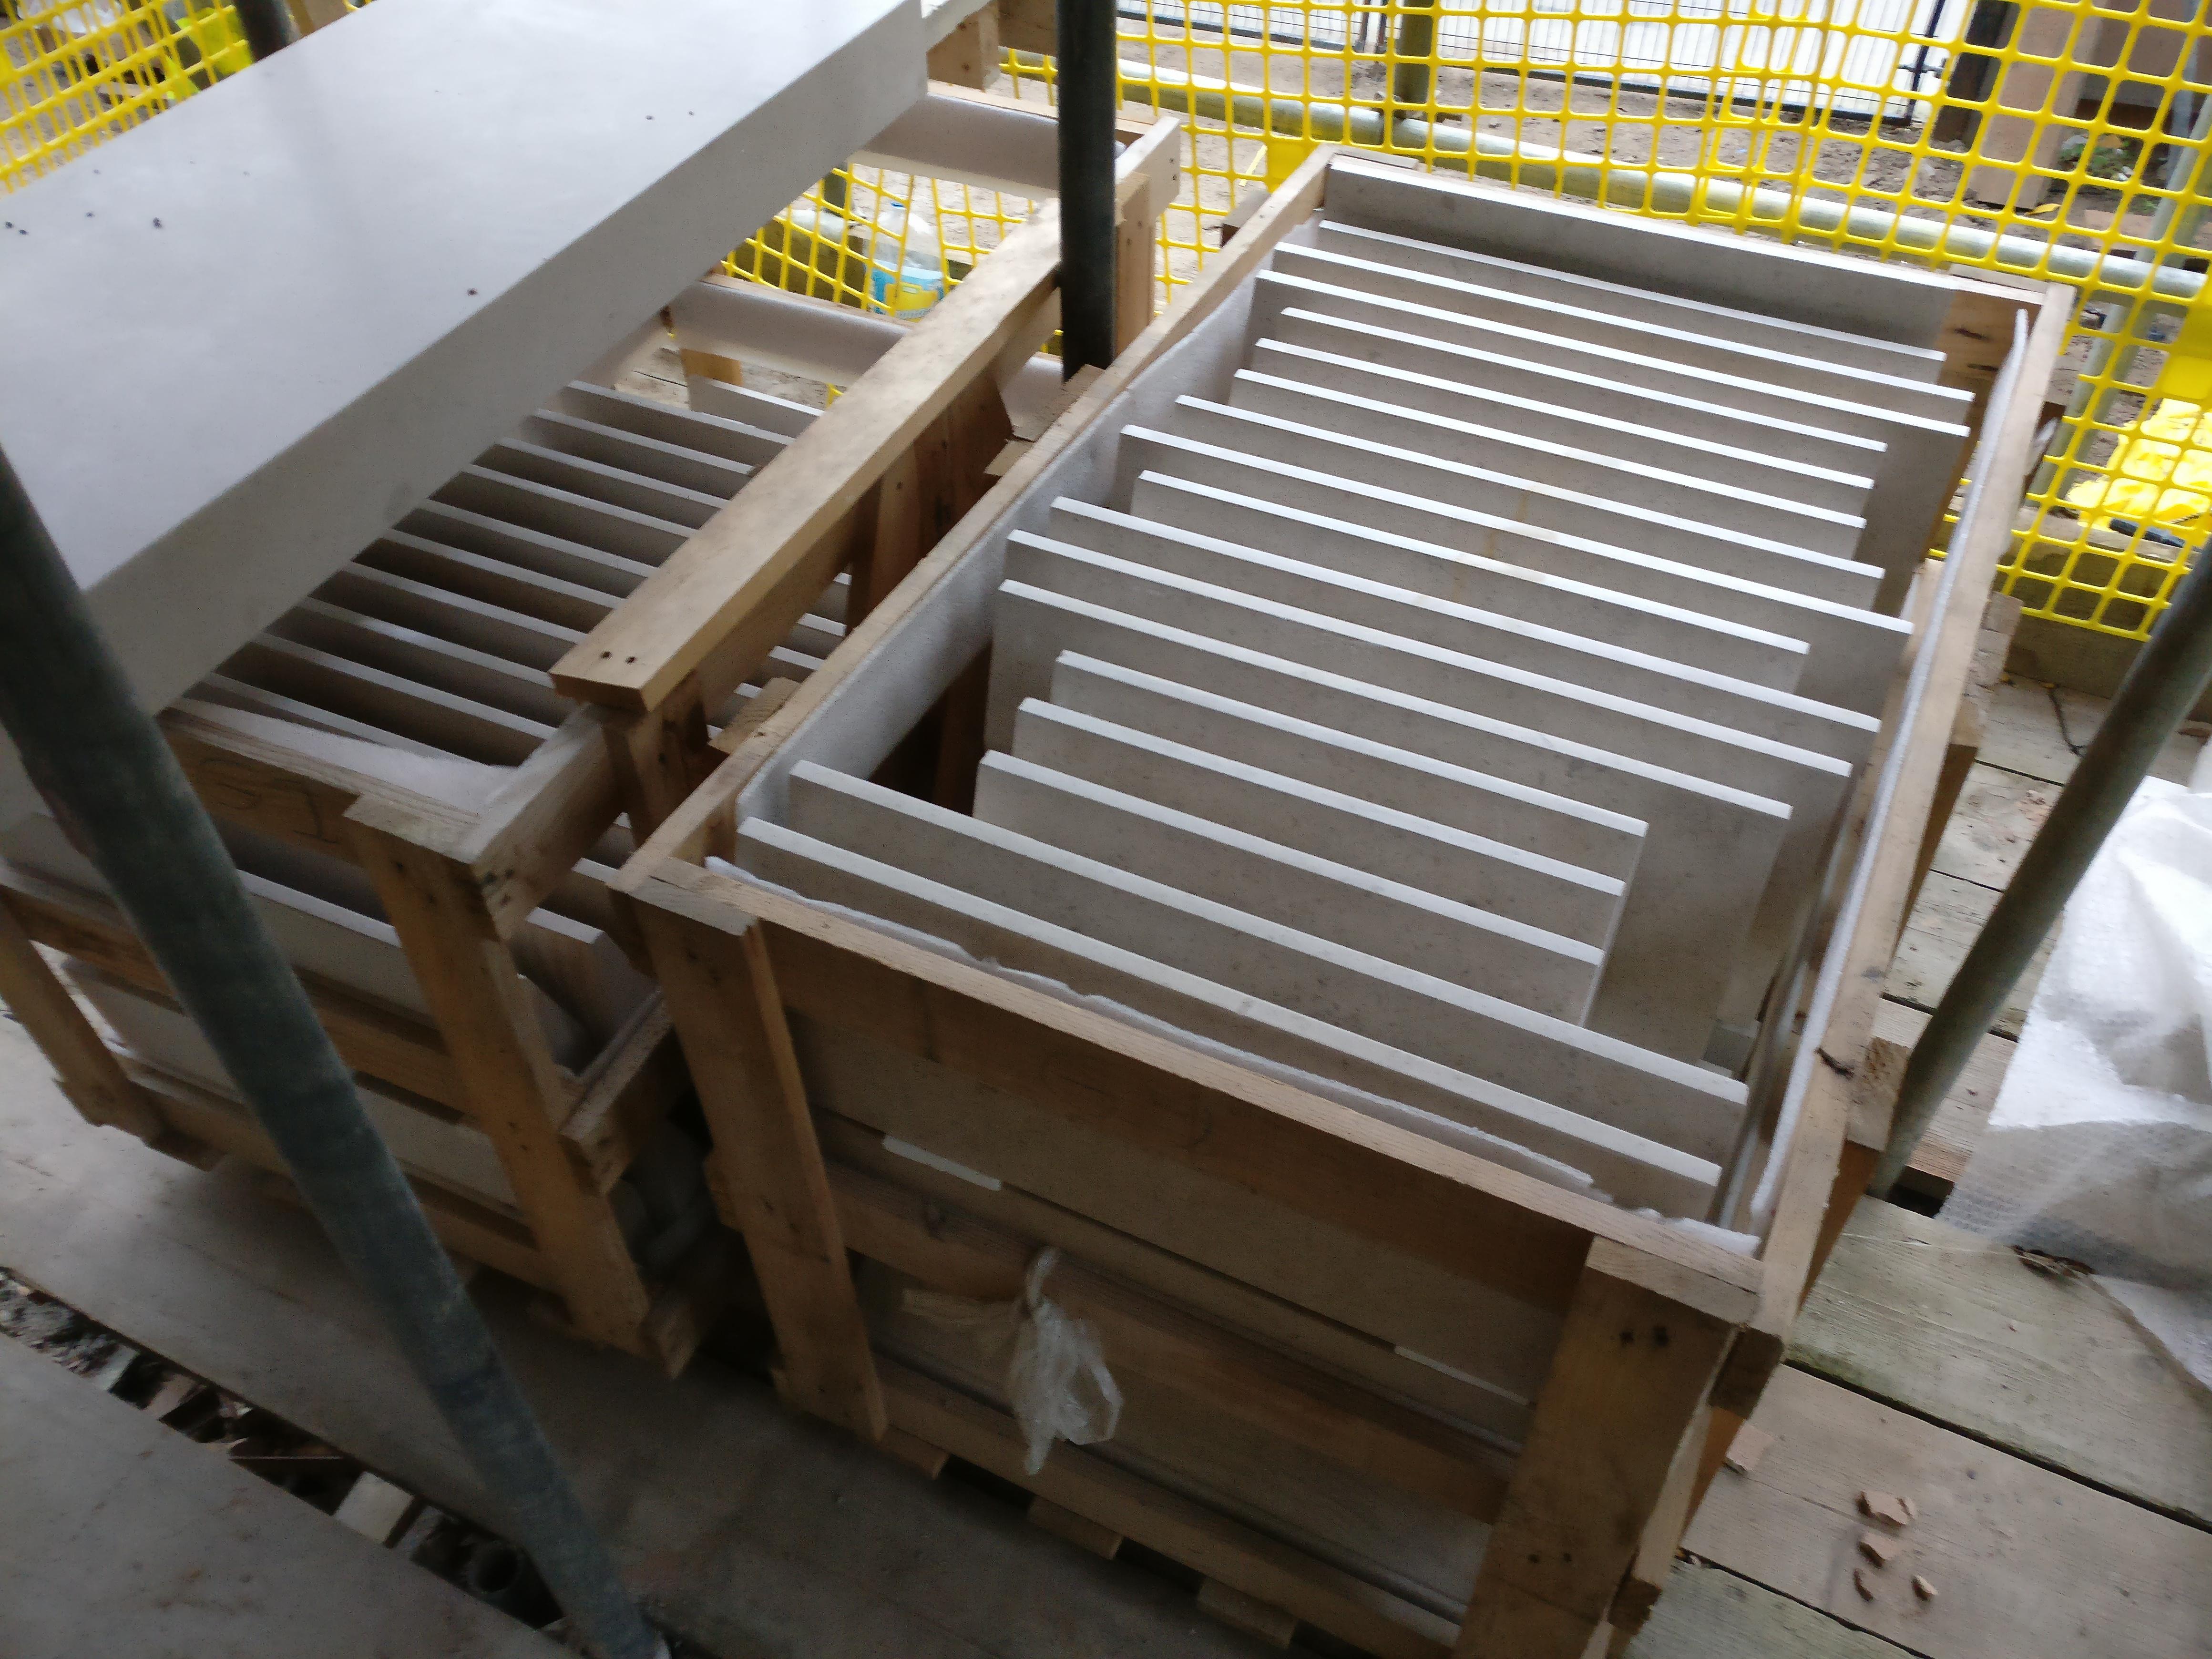 Crate of Dado Stringer Stones